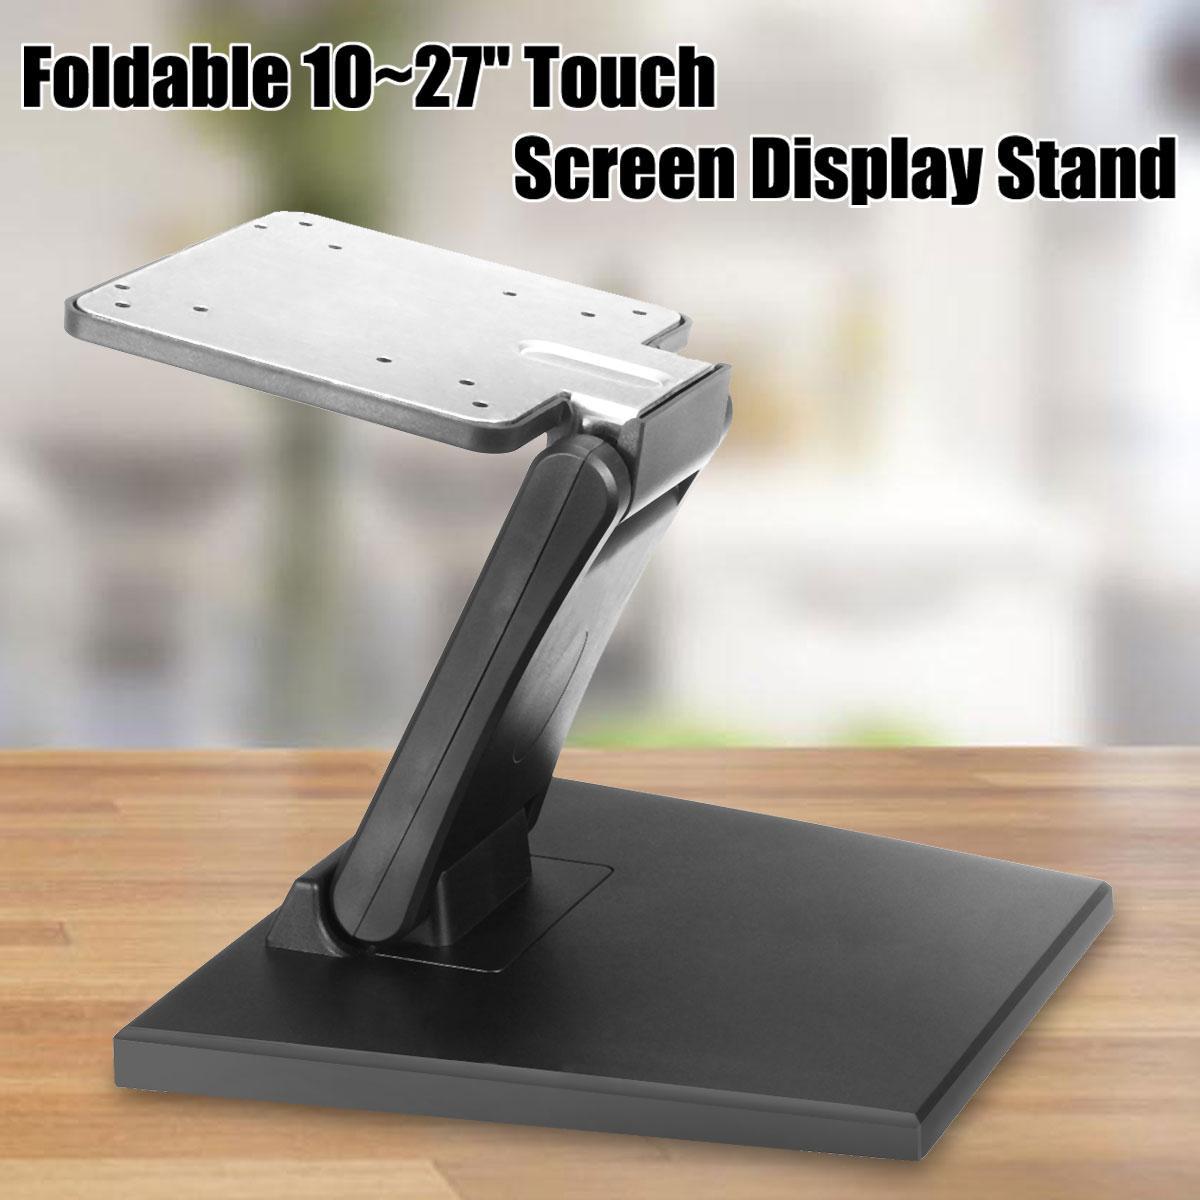 ( READY STOCK) Universal Dell Philips LG Anti-slip Holder Stand LCD Touchscreen Vesa 10-27 Monitor Mount POS PC Bracket